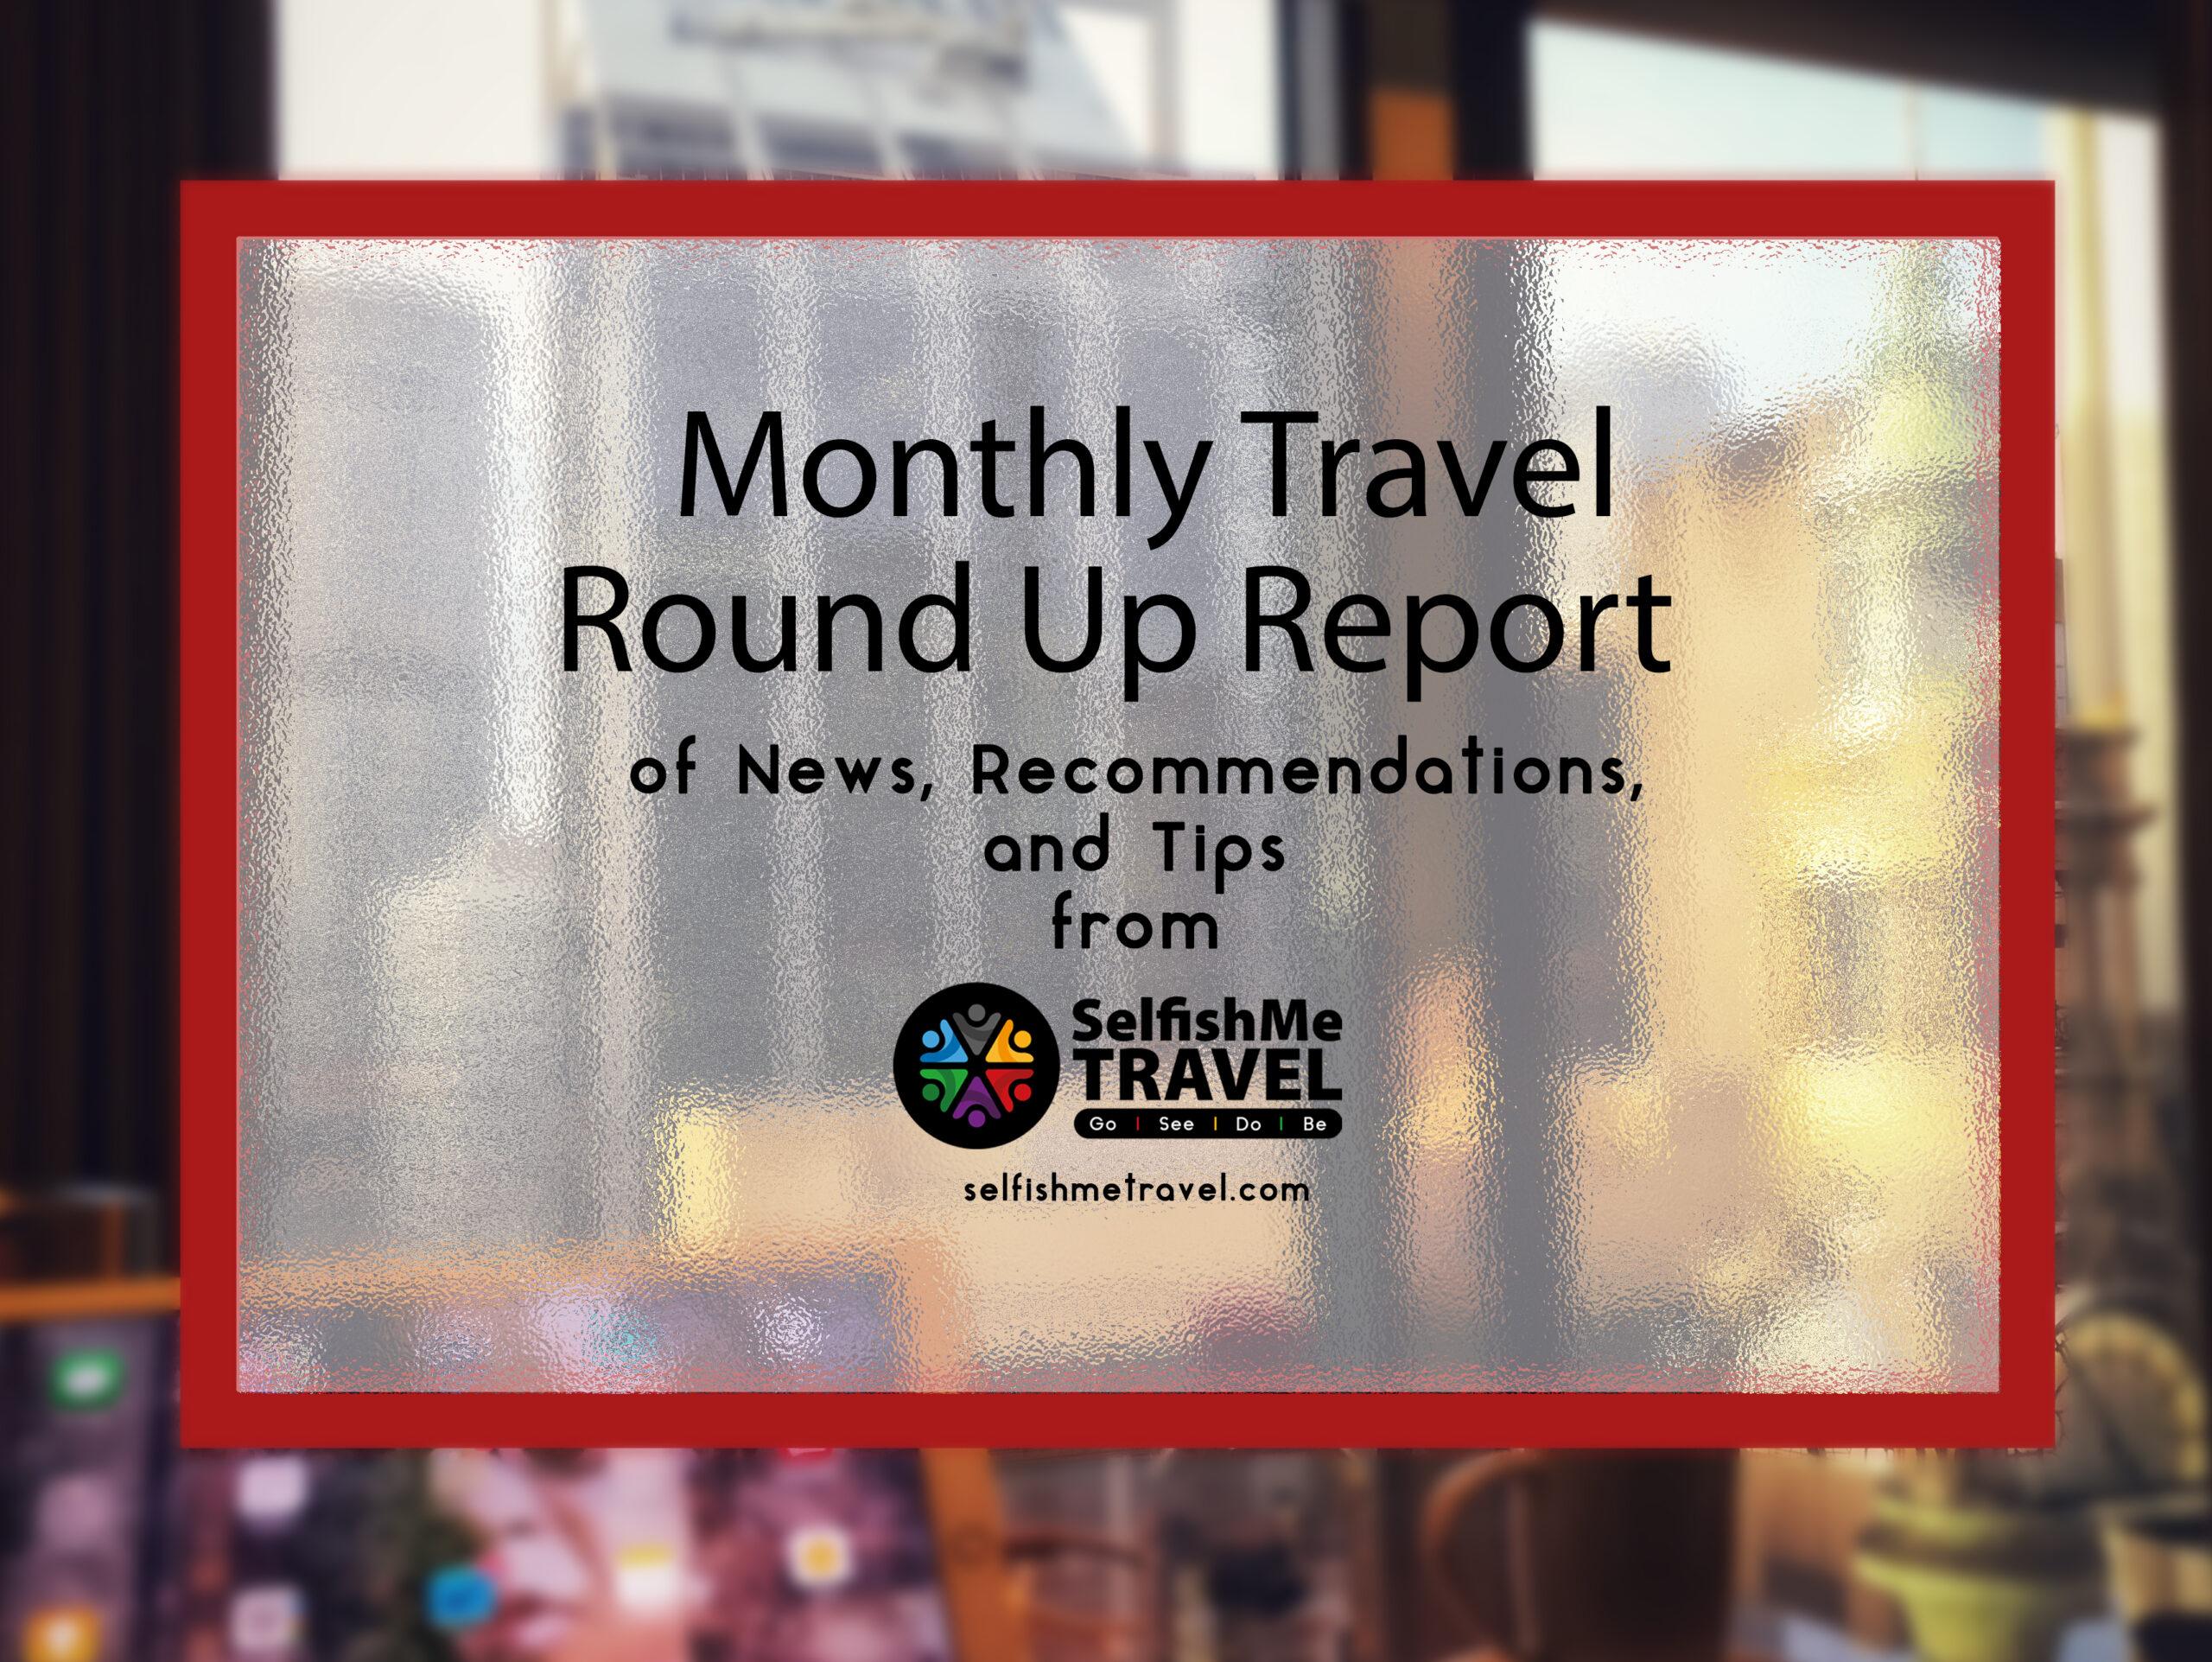 September 2021: A video recap of travel industry news